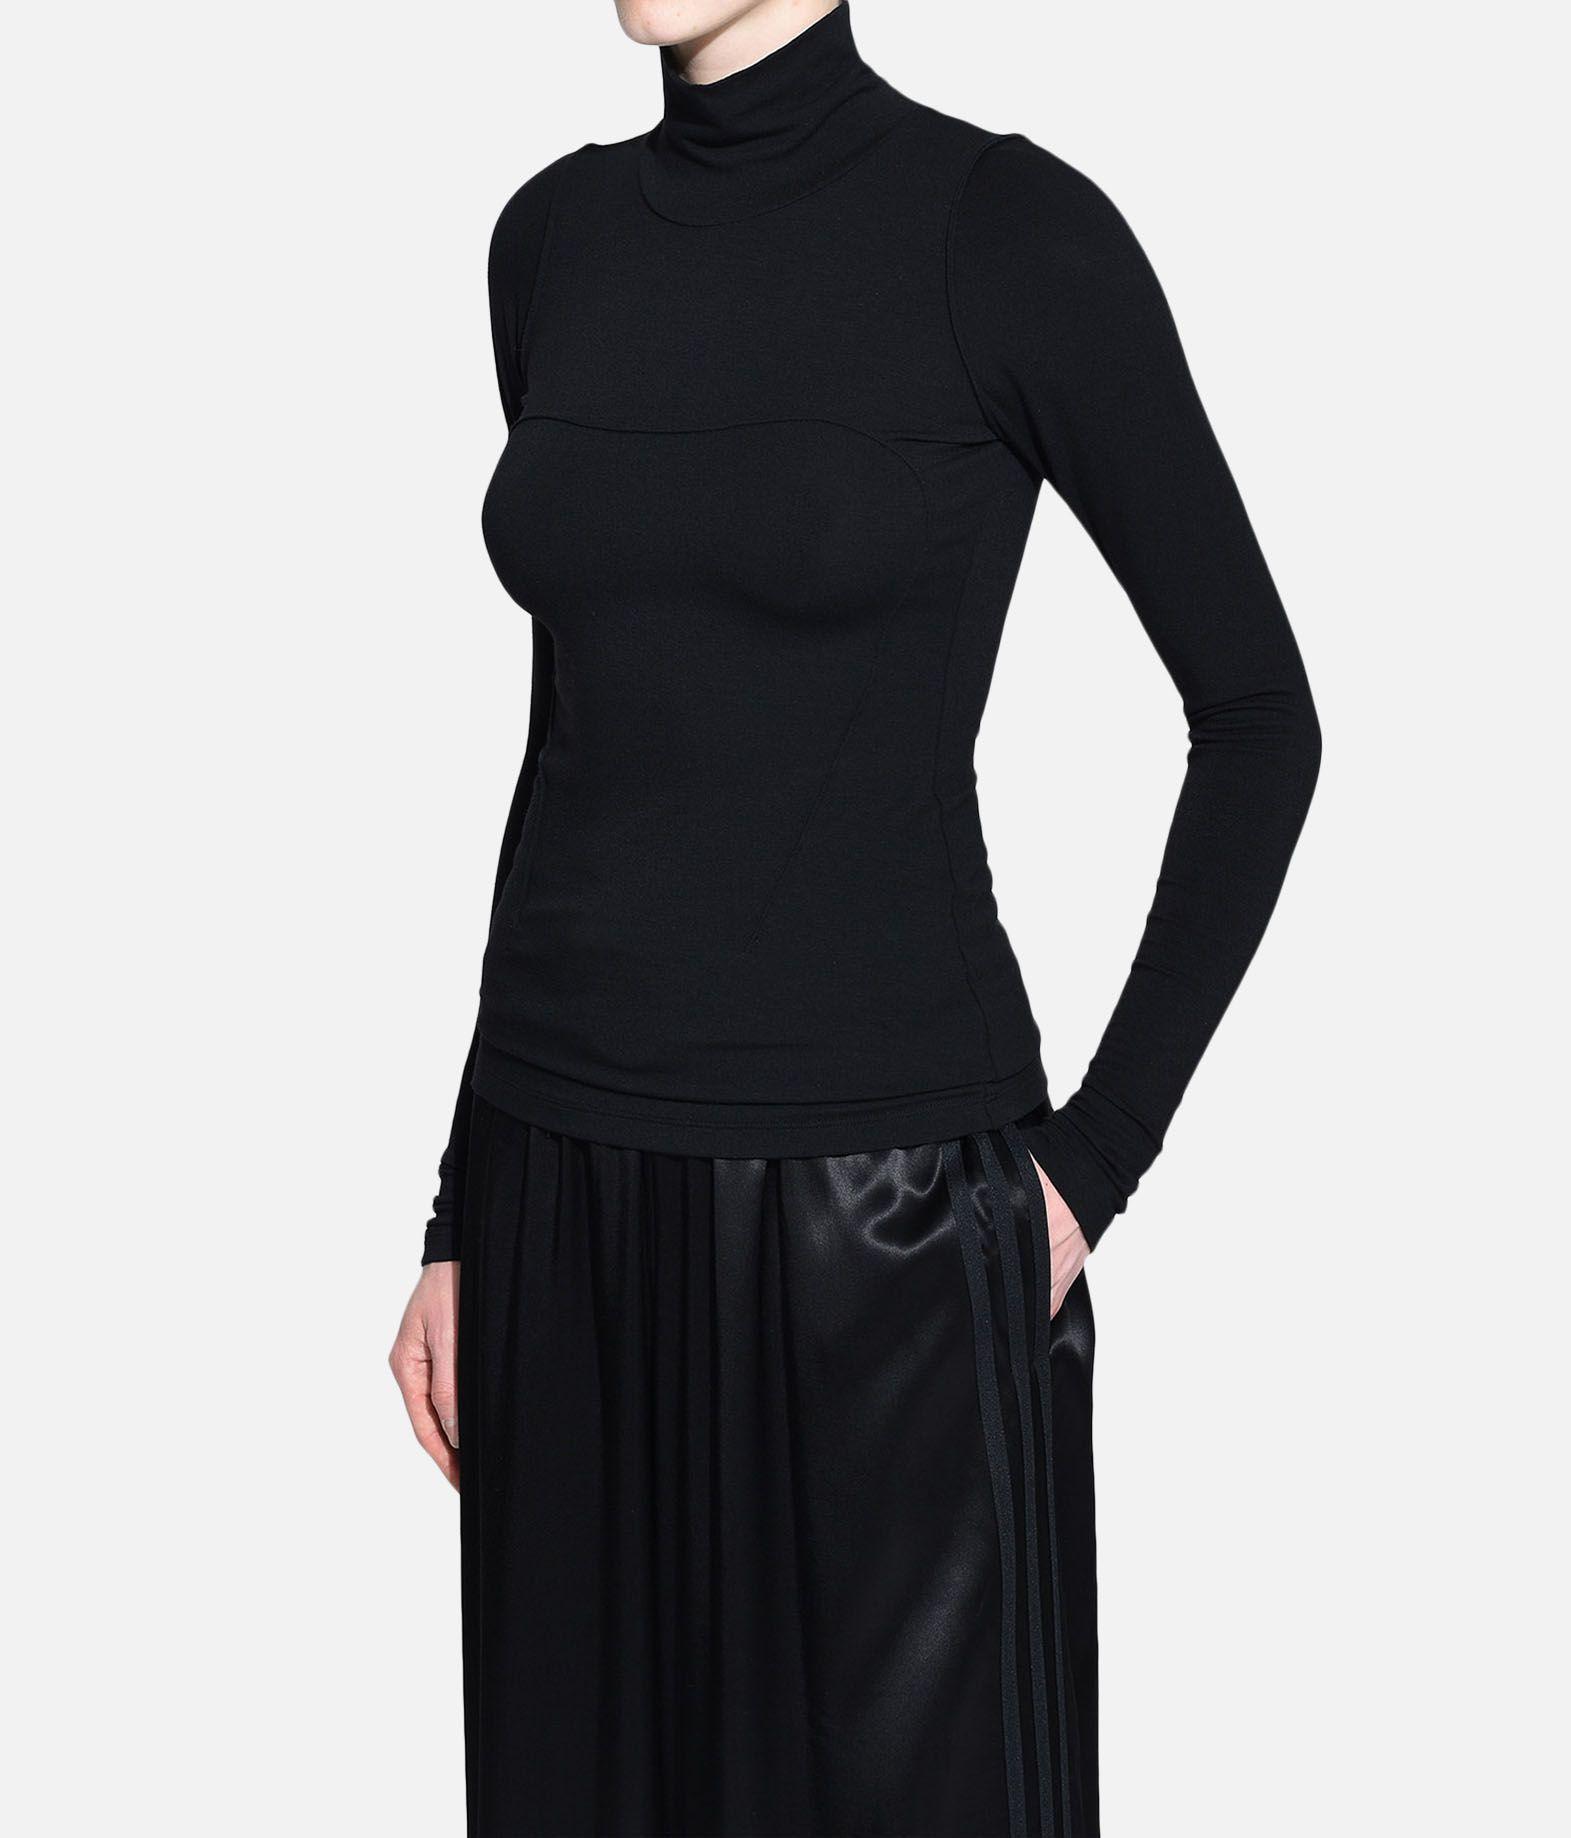 Y-3 Y-3 Prime Wool Tee Long sleeve t-shirt Woman e